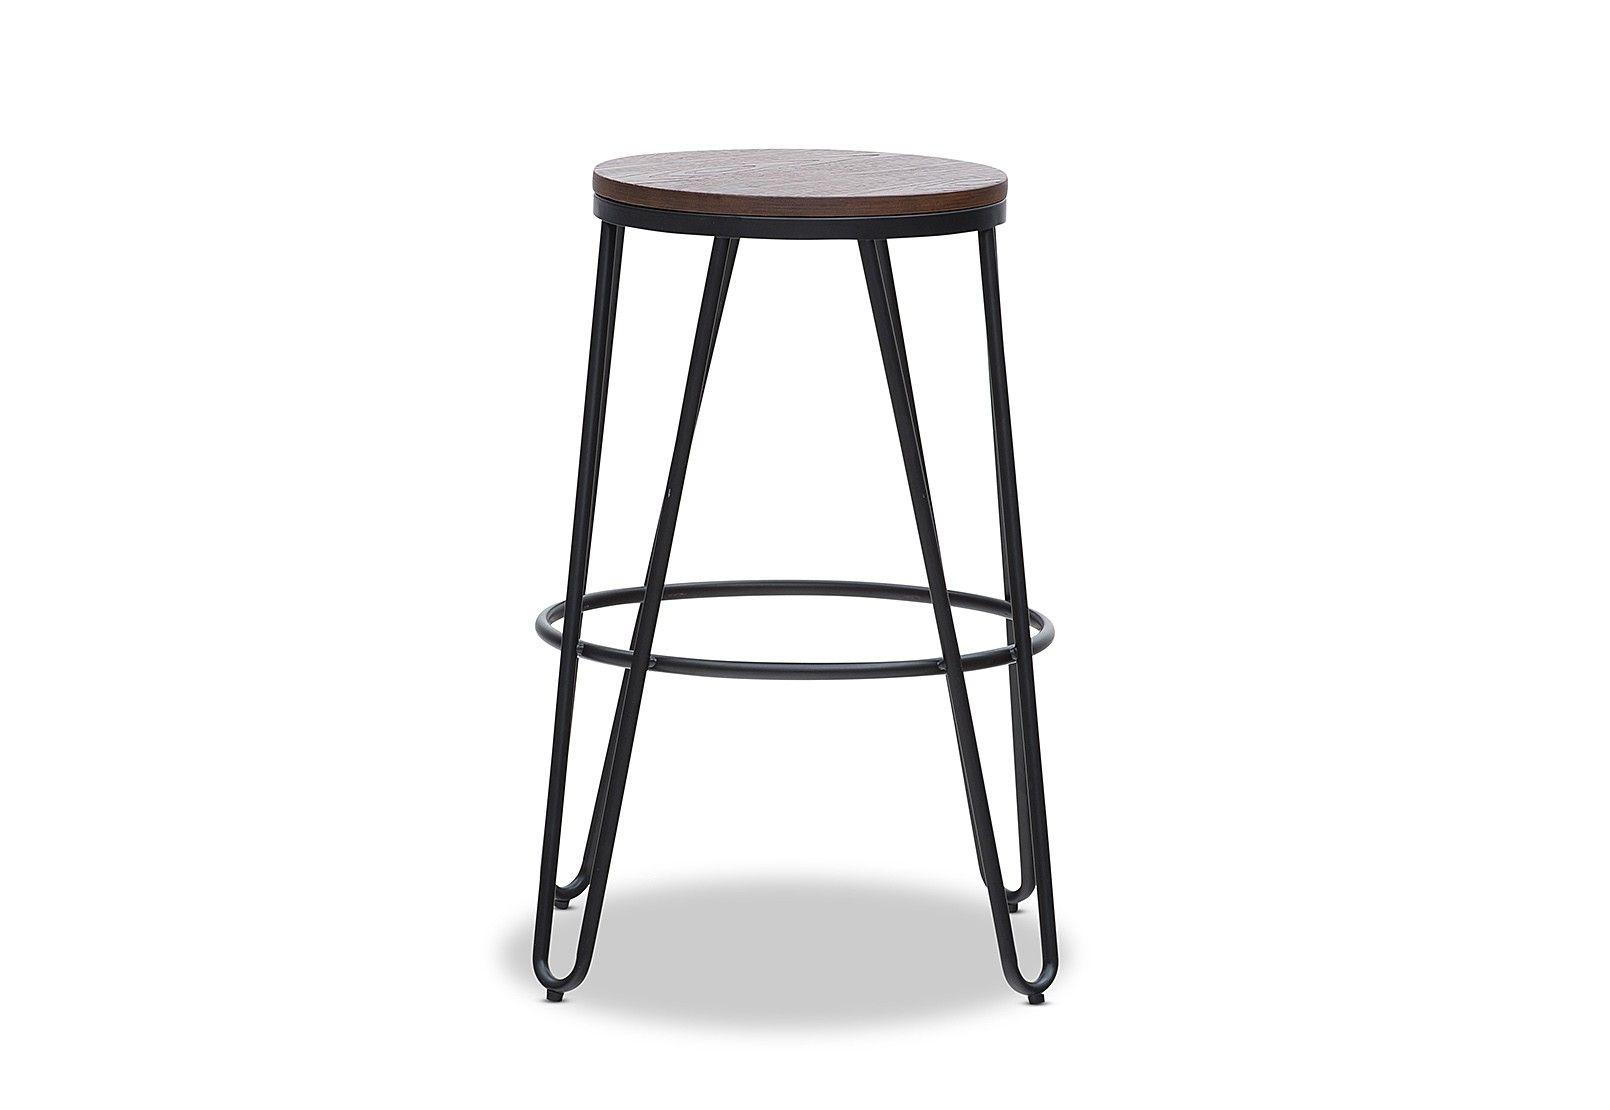 Cool Wooden Bar Stools Perth Wa Emmafreeman Furnitures Di 2019 Inzonedesignstudio Interior Chair Design Inzonedesignstudiocom